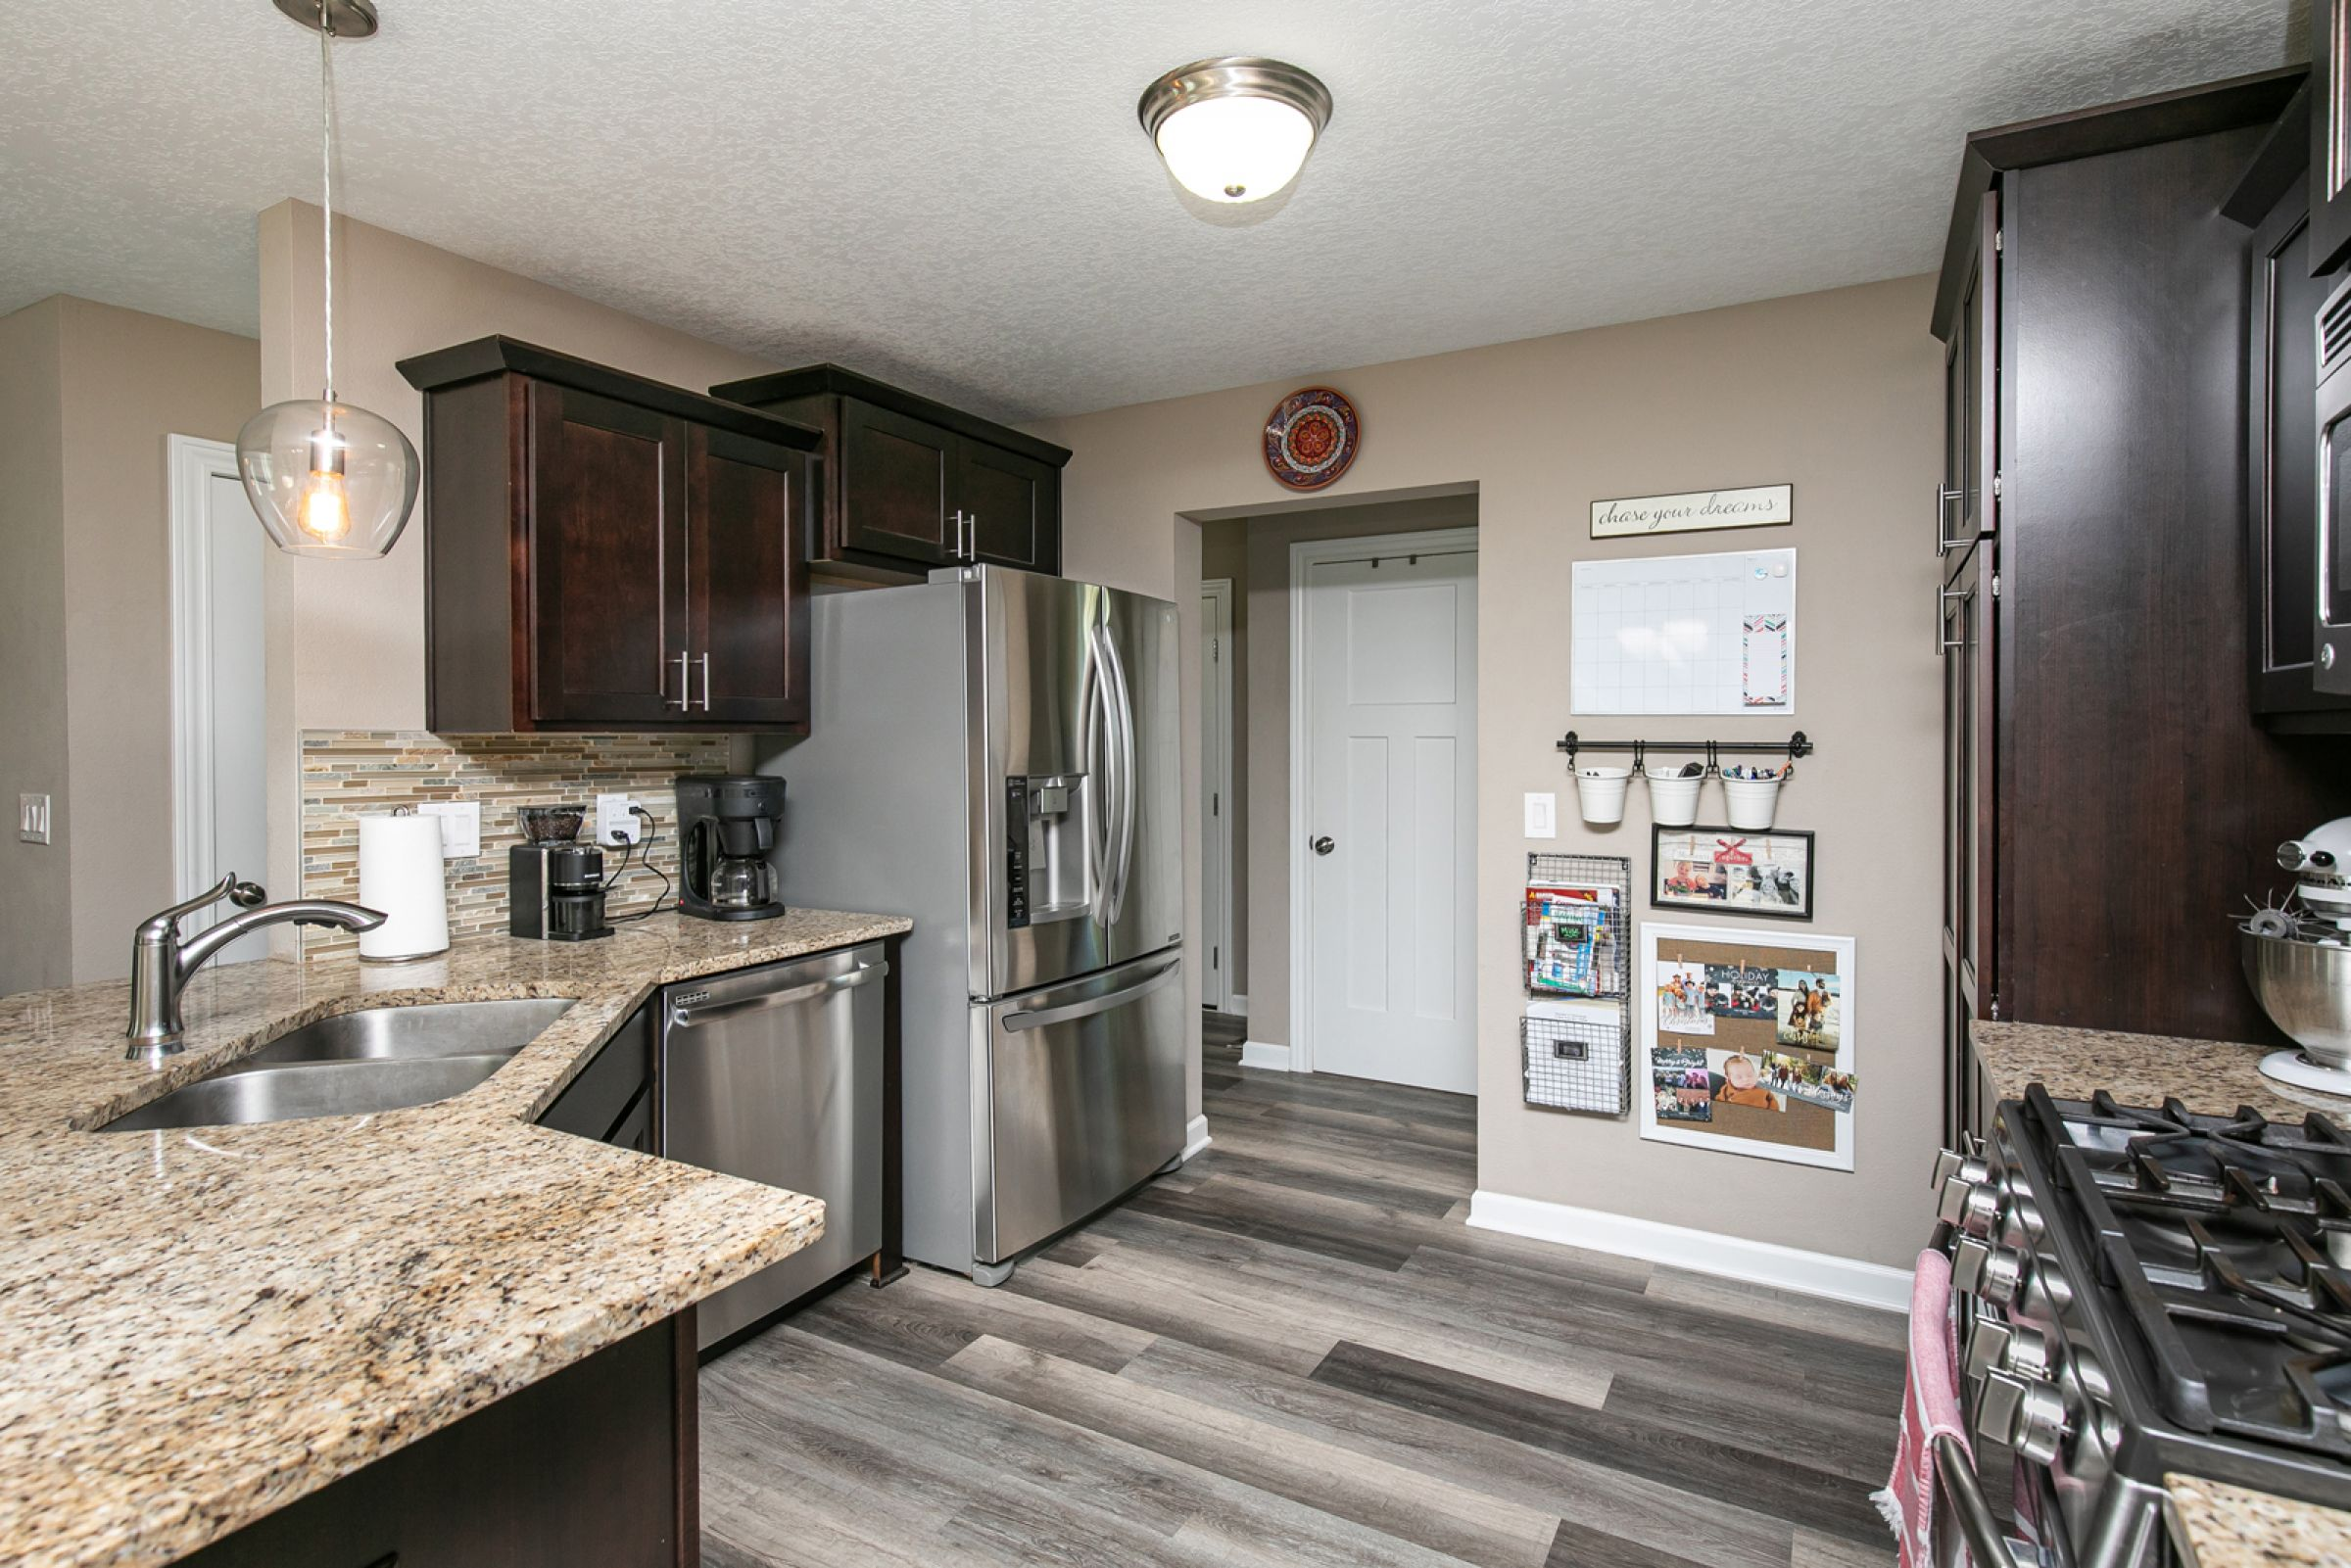 residential-warren-county-iowa-0-acres-listing-number-15685-7-2021-08-31-032158.jpg